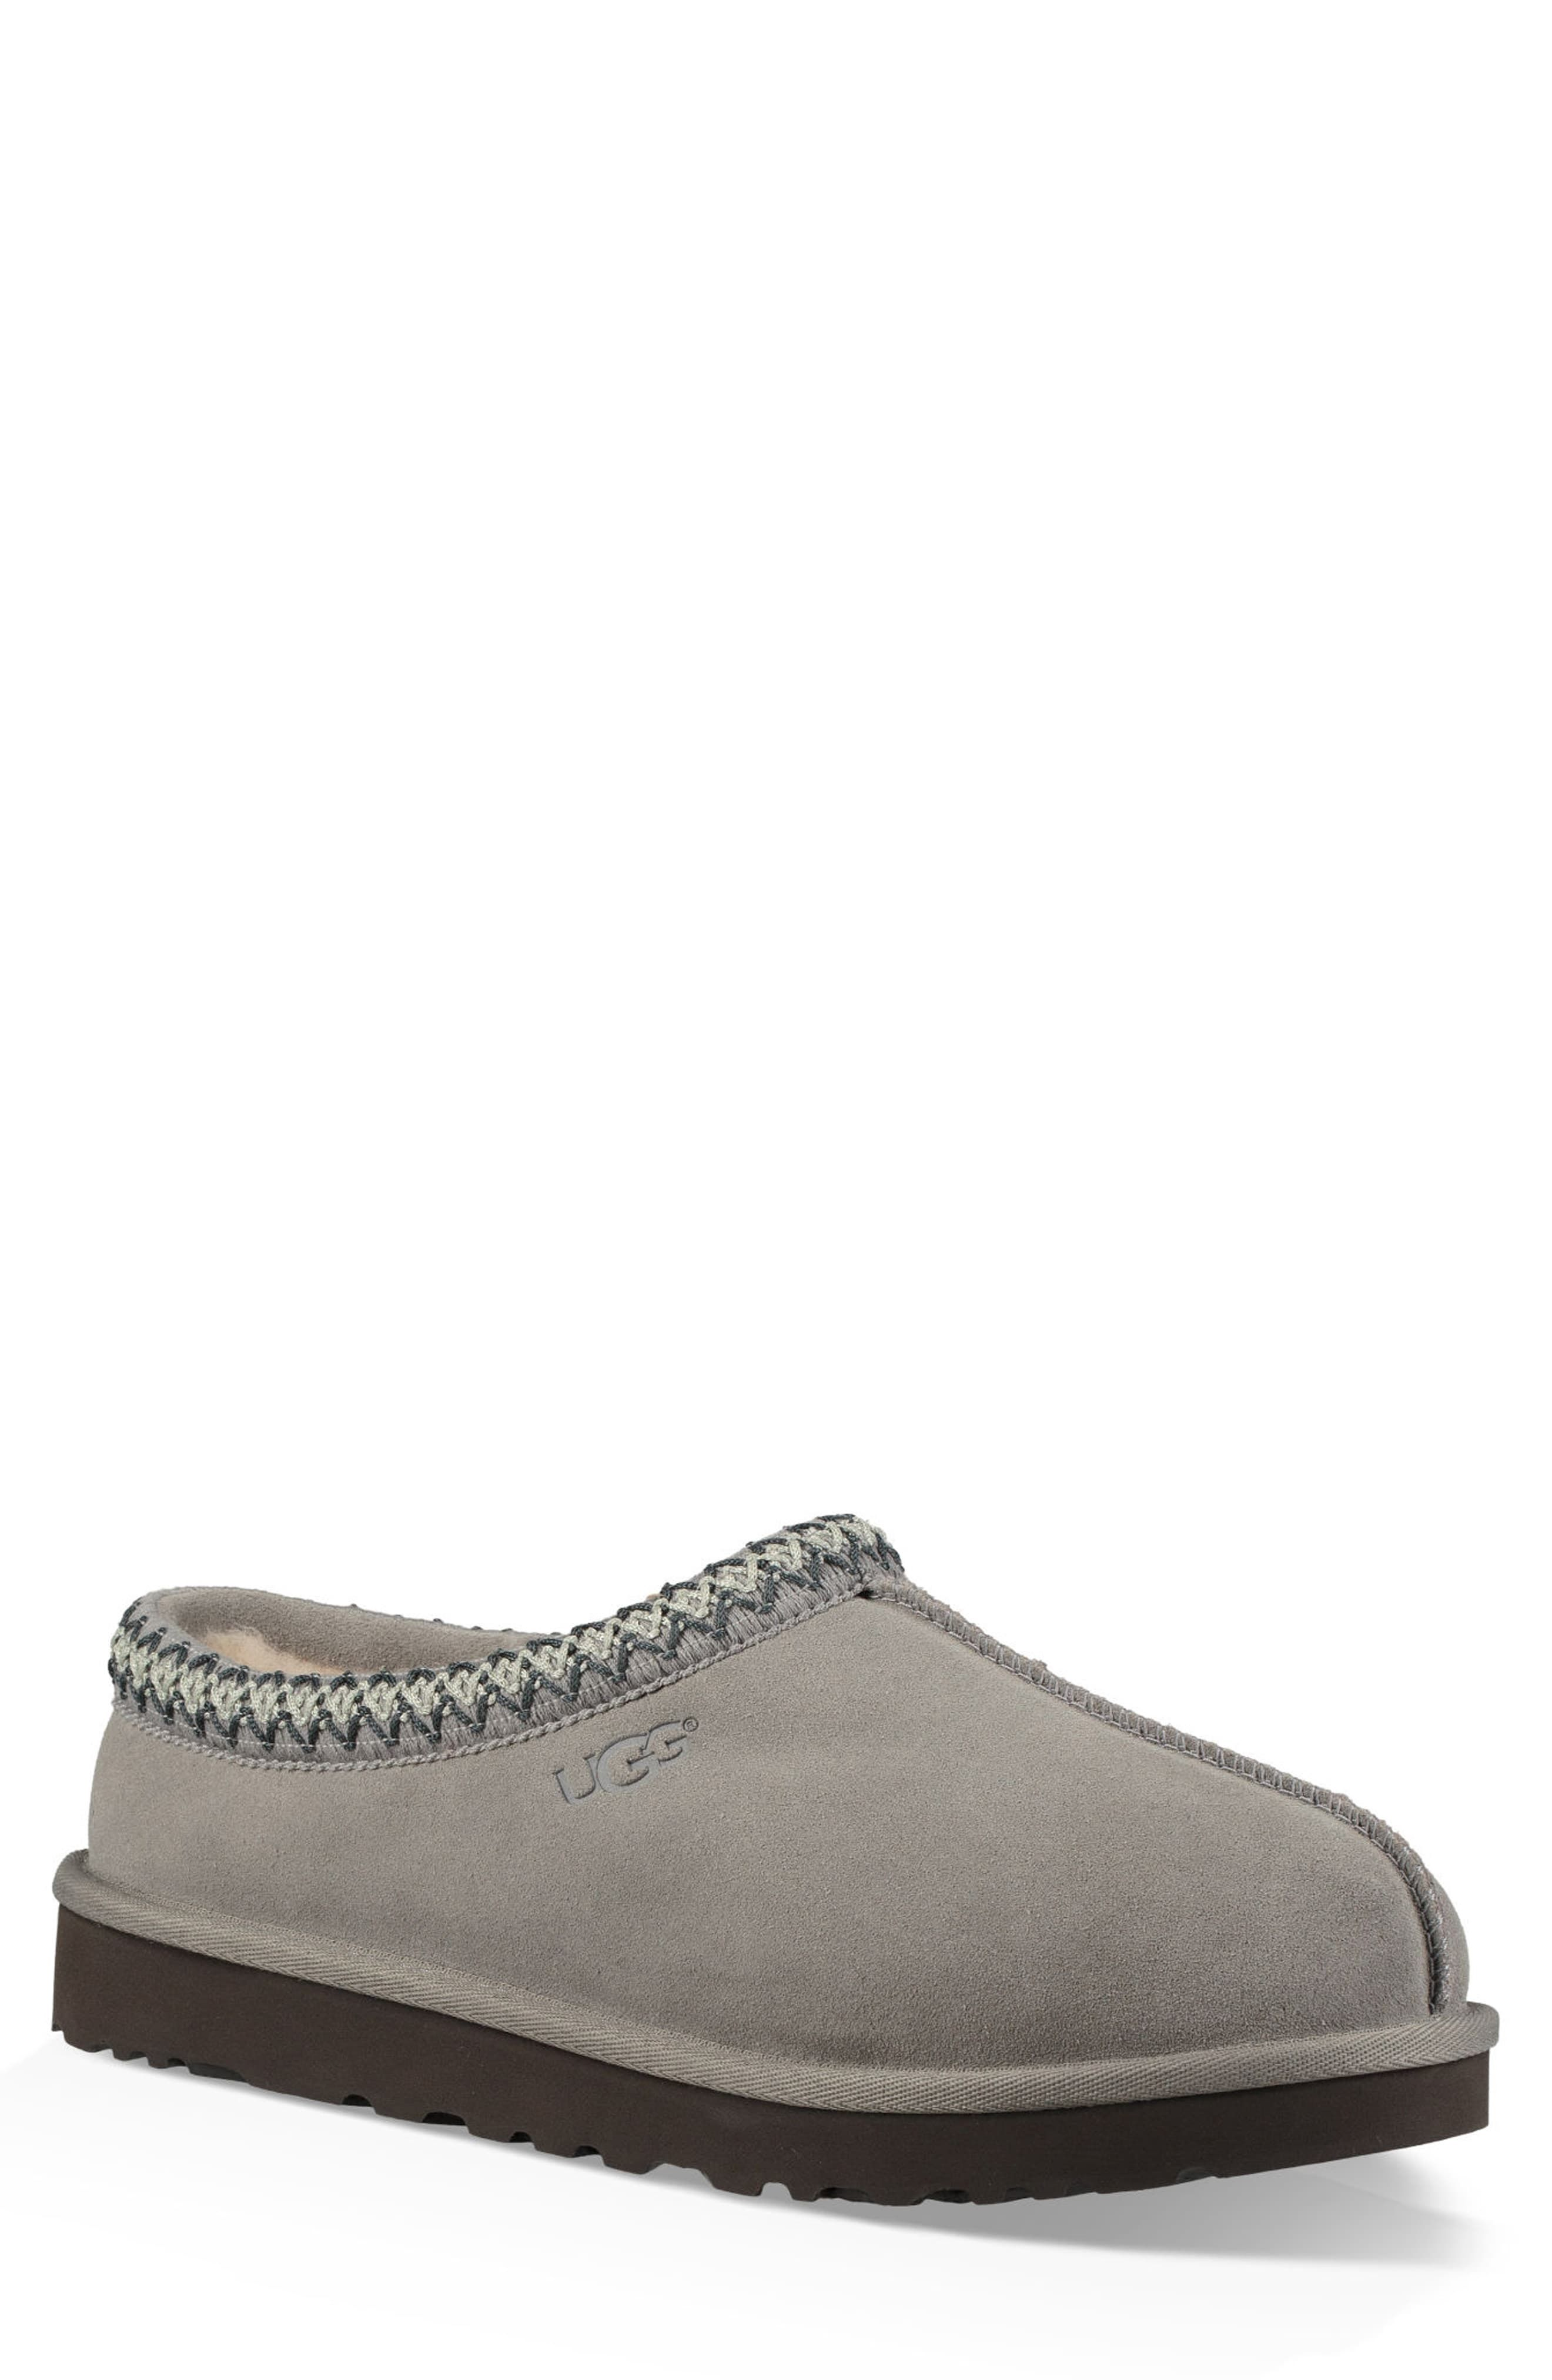 1dd6d8e8ab8 Men's Ugg 'Tasman' Slipper, Size 16 M - Black in 2019 | Products ...